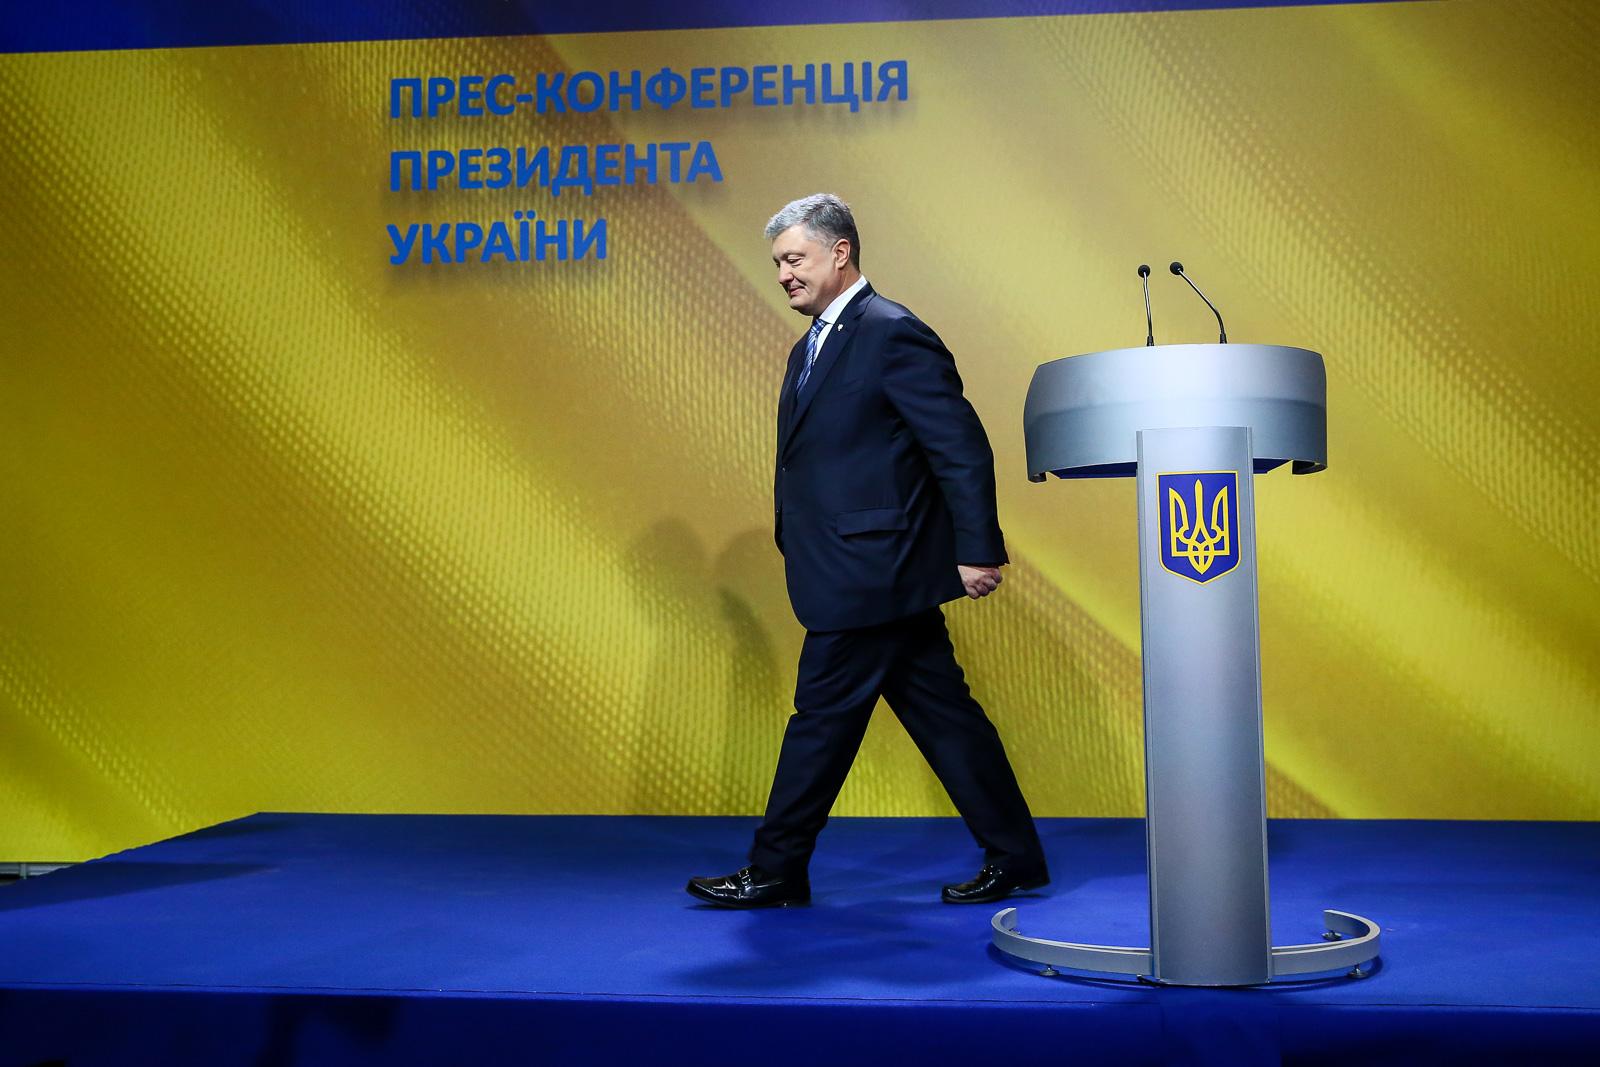 [img]https://www.kyivpost.com/wp-content/uploads/2018/12/OLE_5188.jpg[/img]